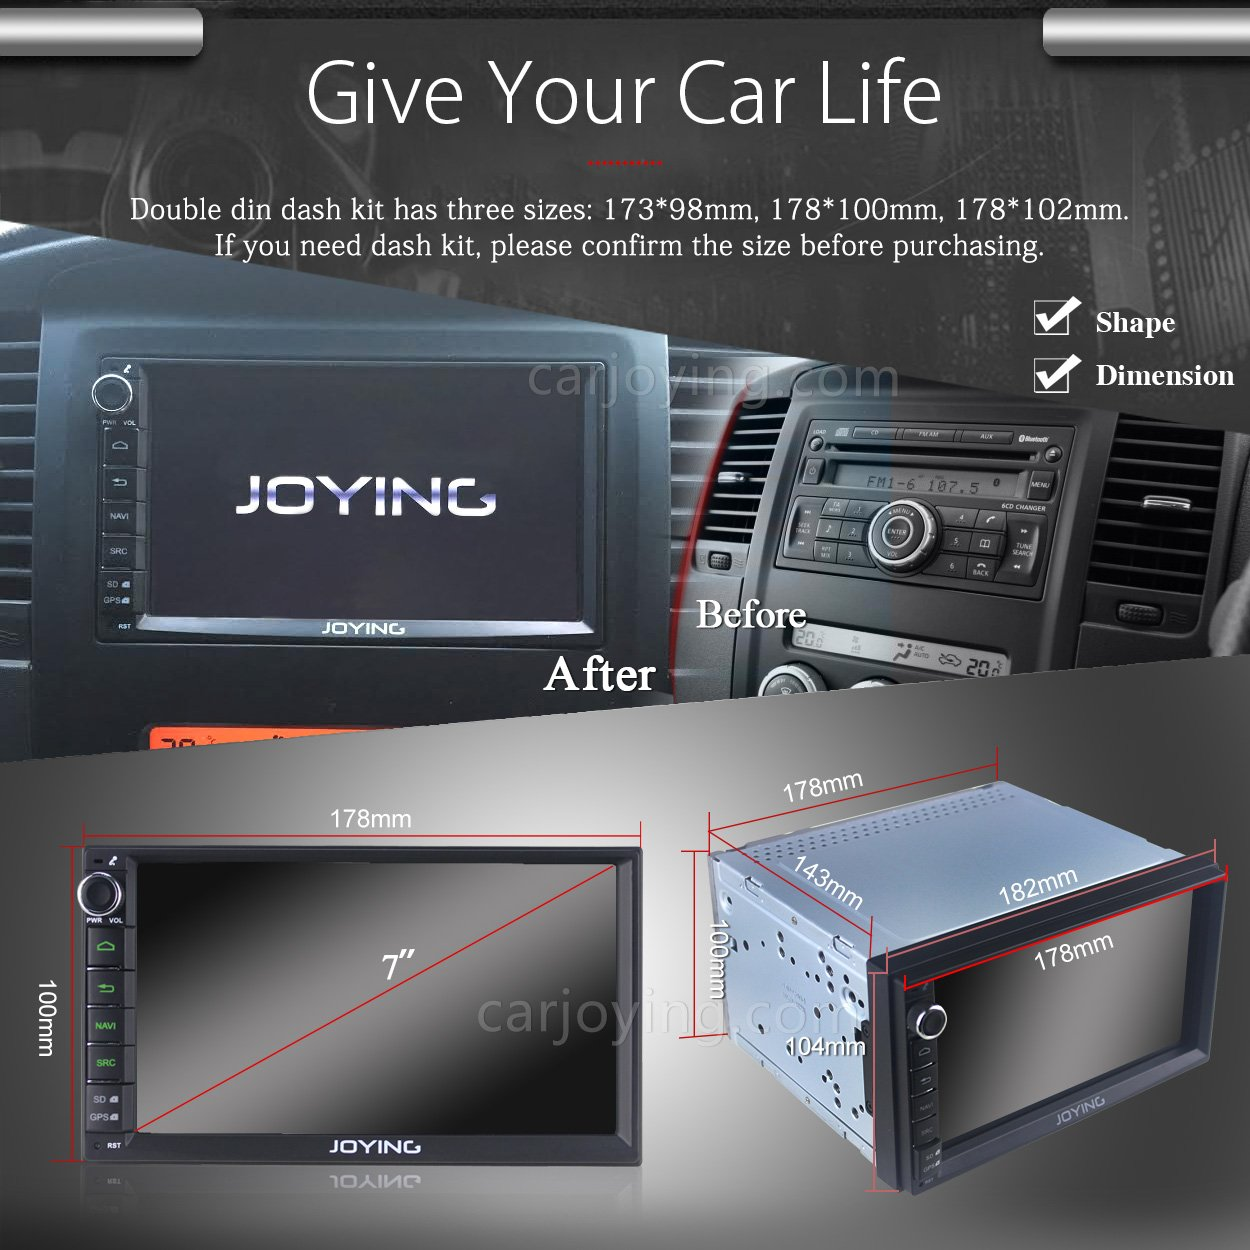 Joying 7 universal car radio android 6 0 marshmallow ddr3 2gb ram quad core auto stereo gps navigation head unit 1024 600 hd capacitive touch screen